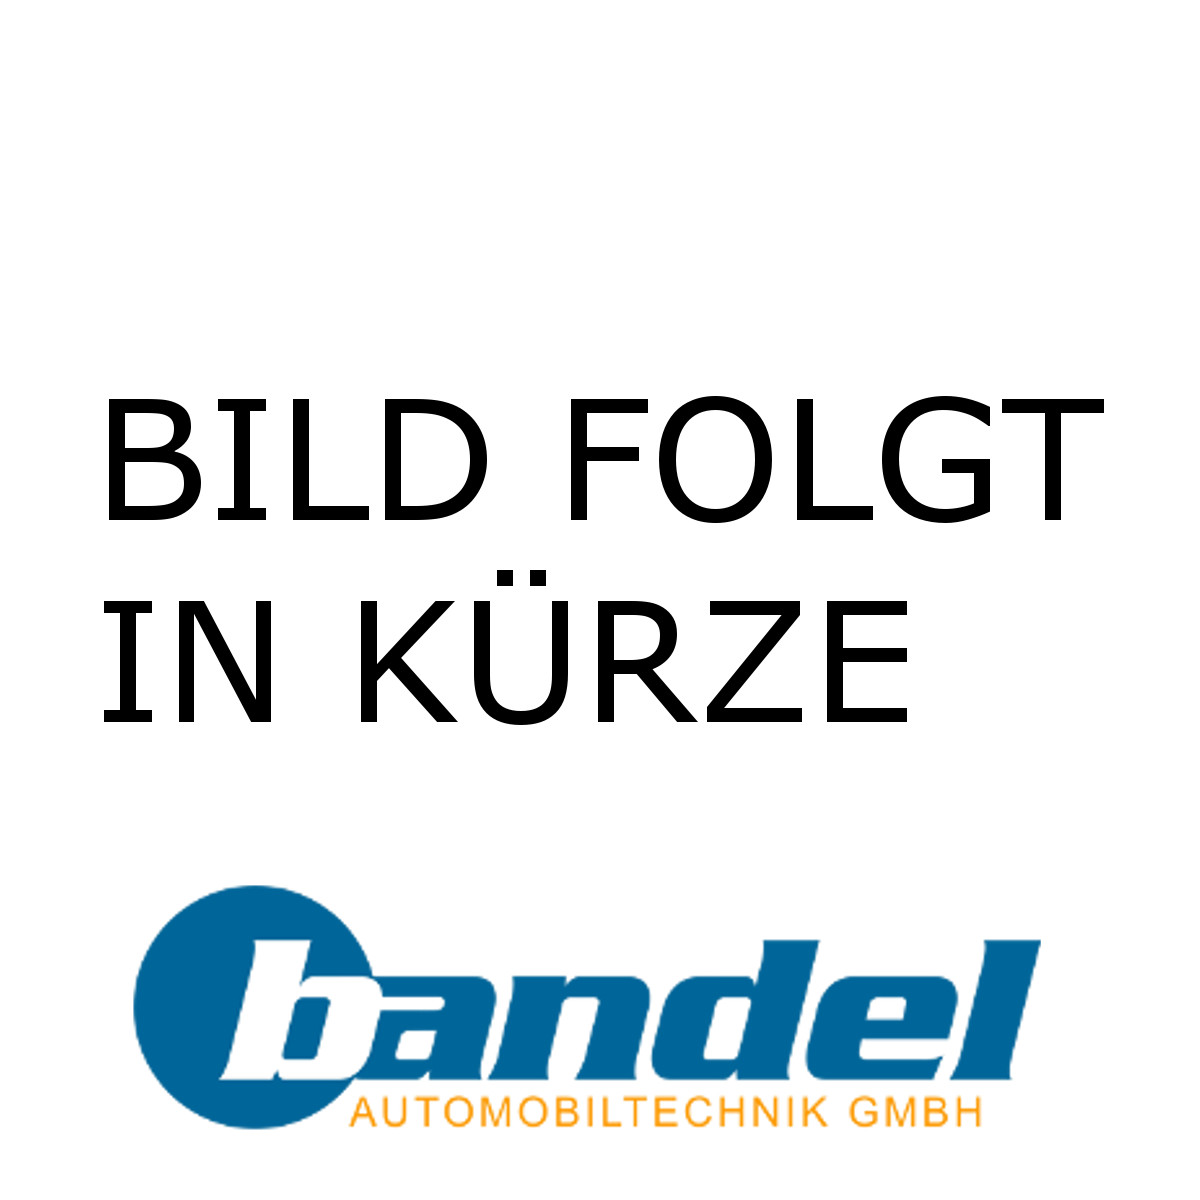 KAYABA STAUBSCHUTZ-SATZ ANSCHLAGPUFFER STOßDÄMPFER HINTEN VW GOLF 3 VARIANT Pic:1